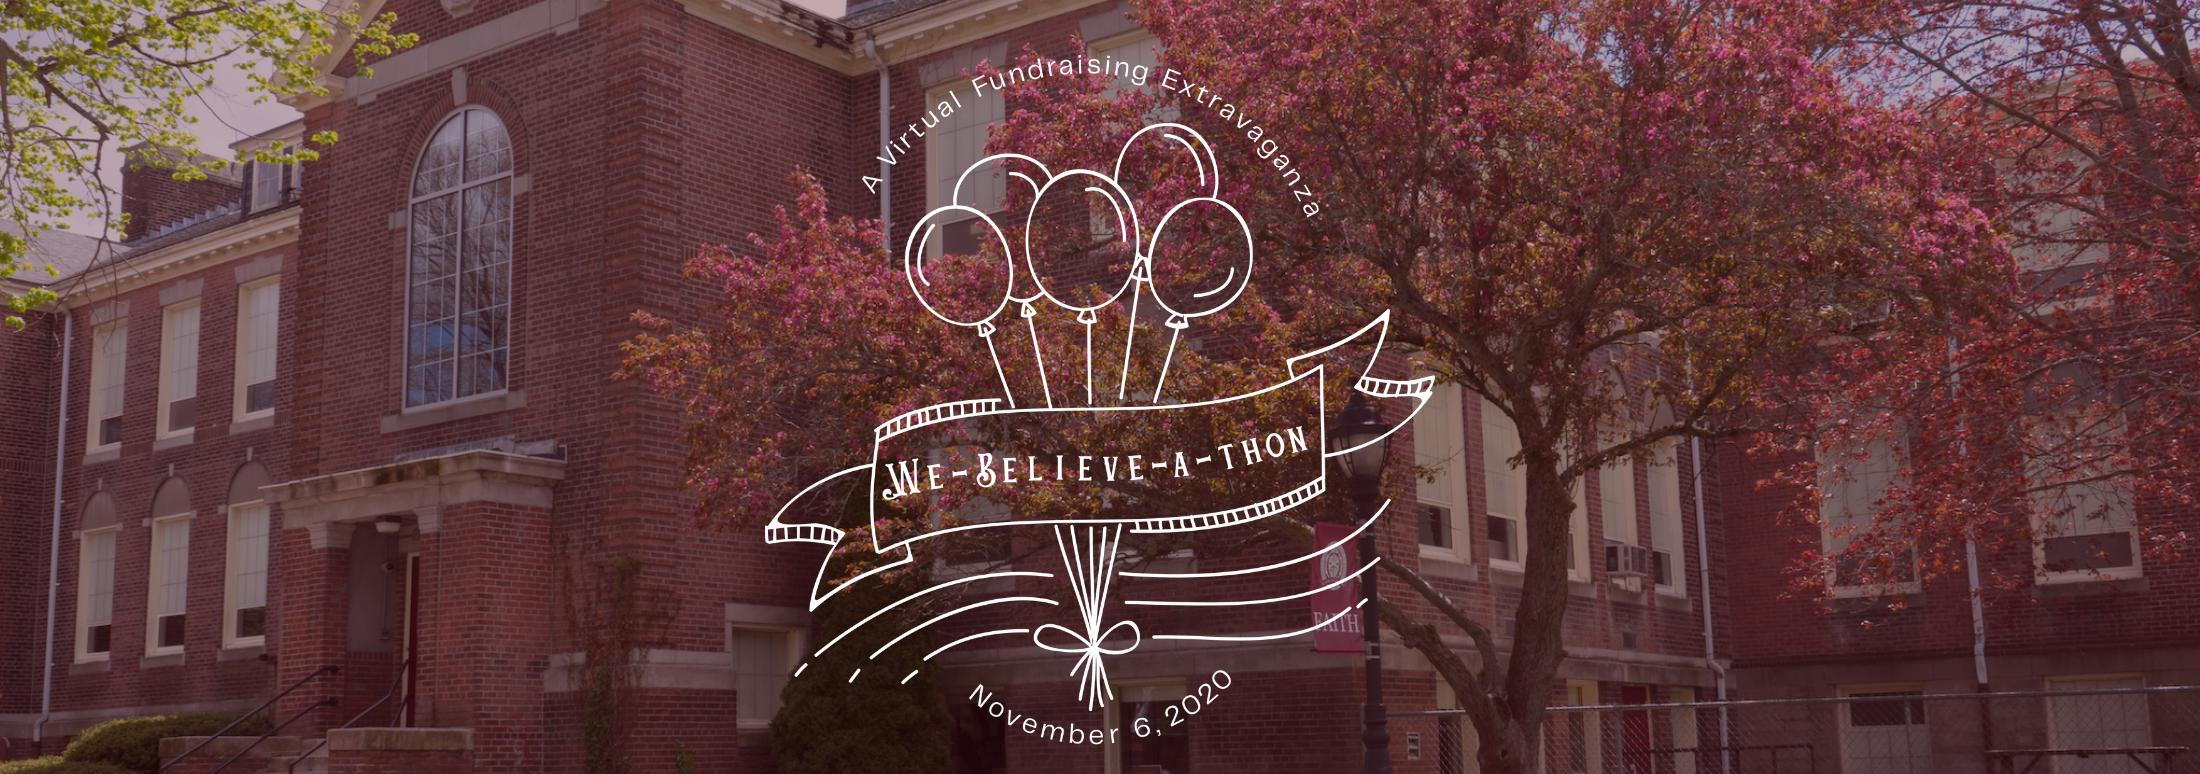 We-Believe-a-thon logo